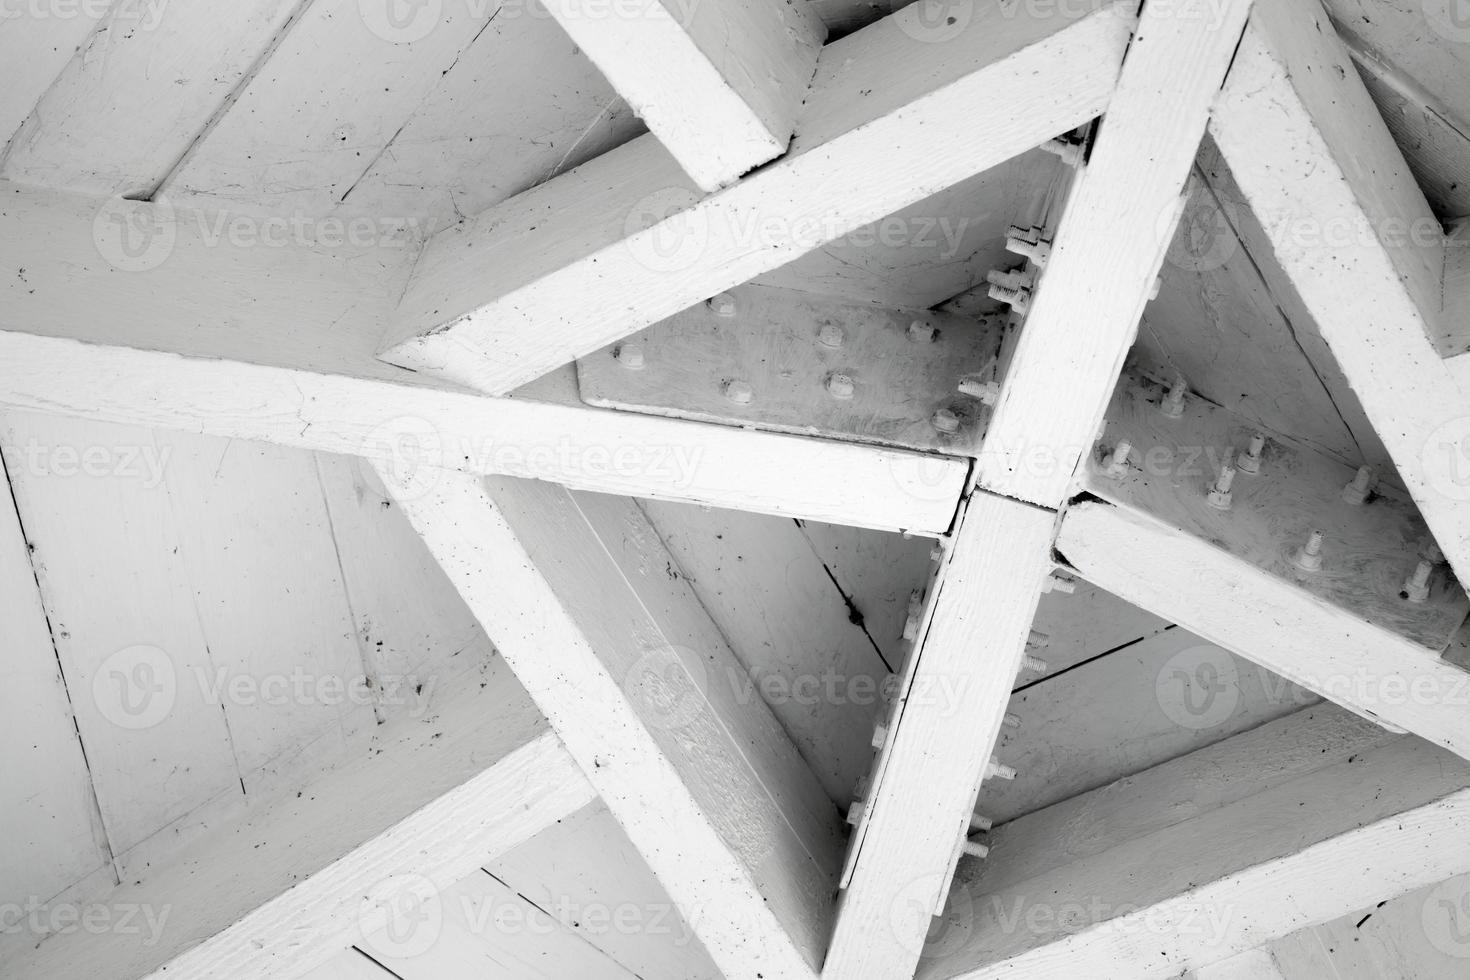 abstrakt träarkitekturfragment, takcentrum foto